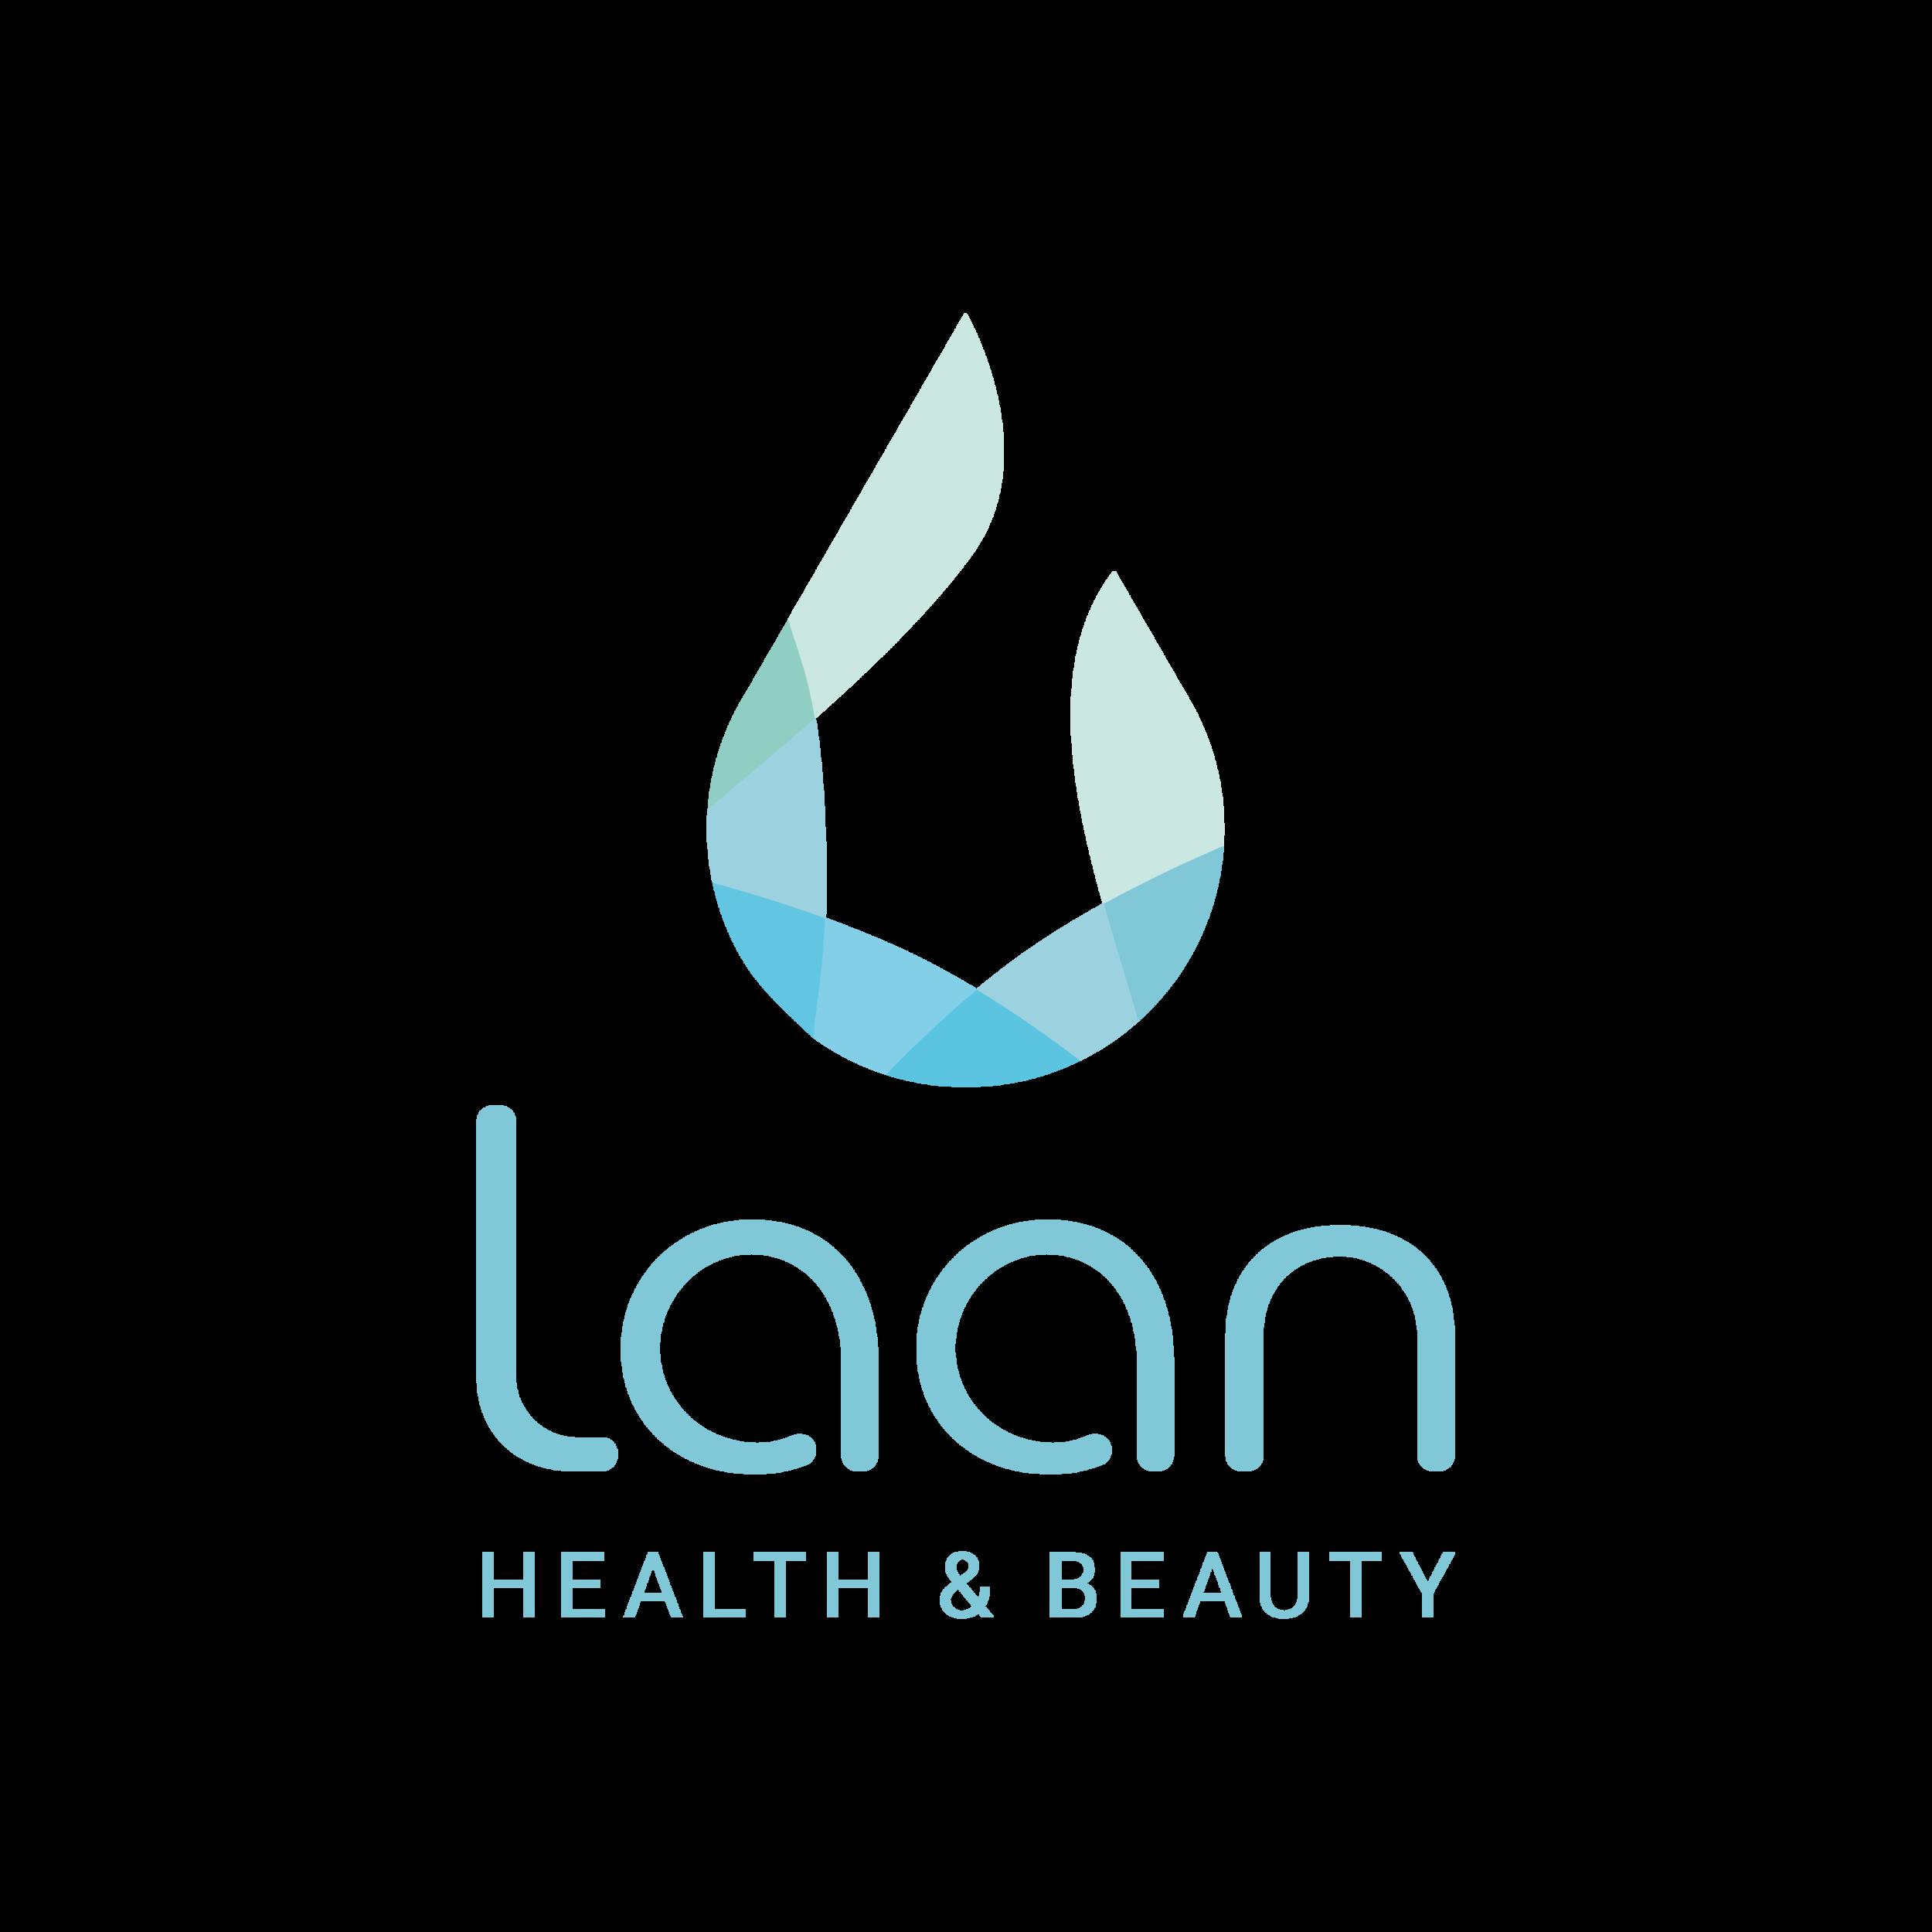 laan - SCREEN - rgb_logo color.png